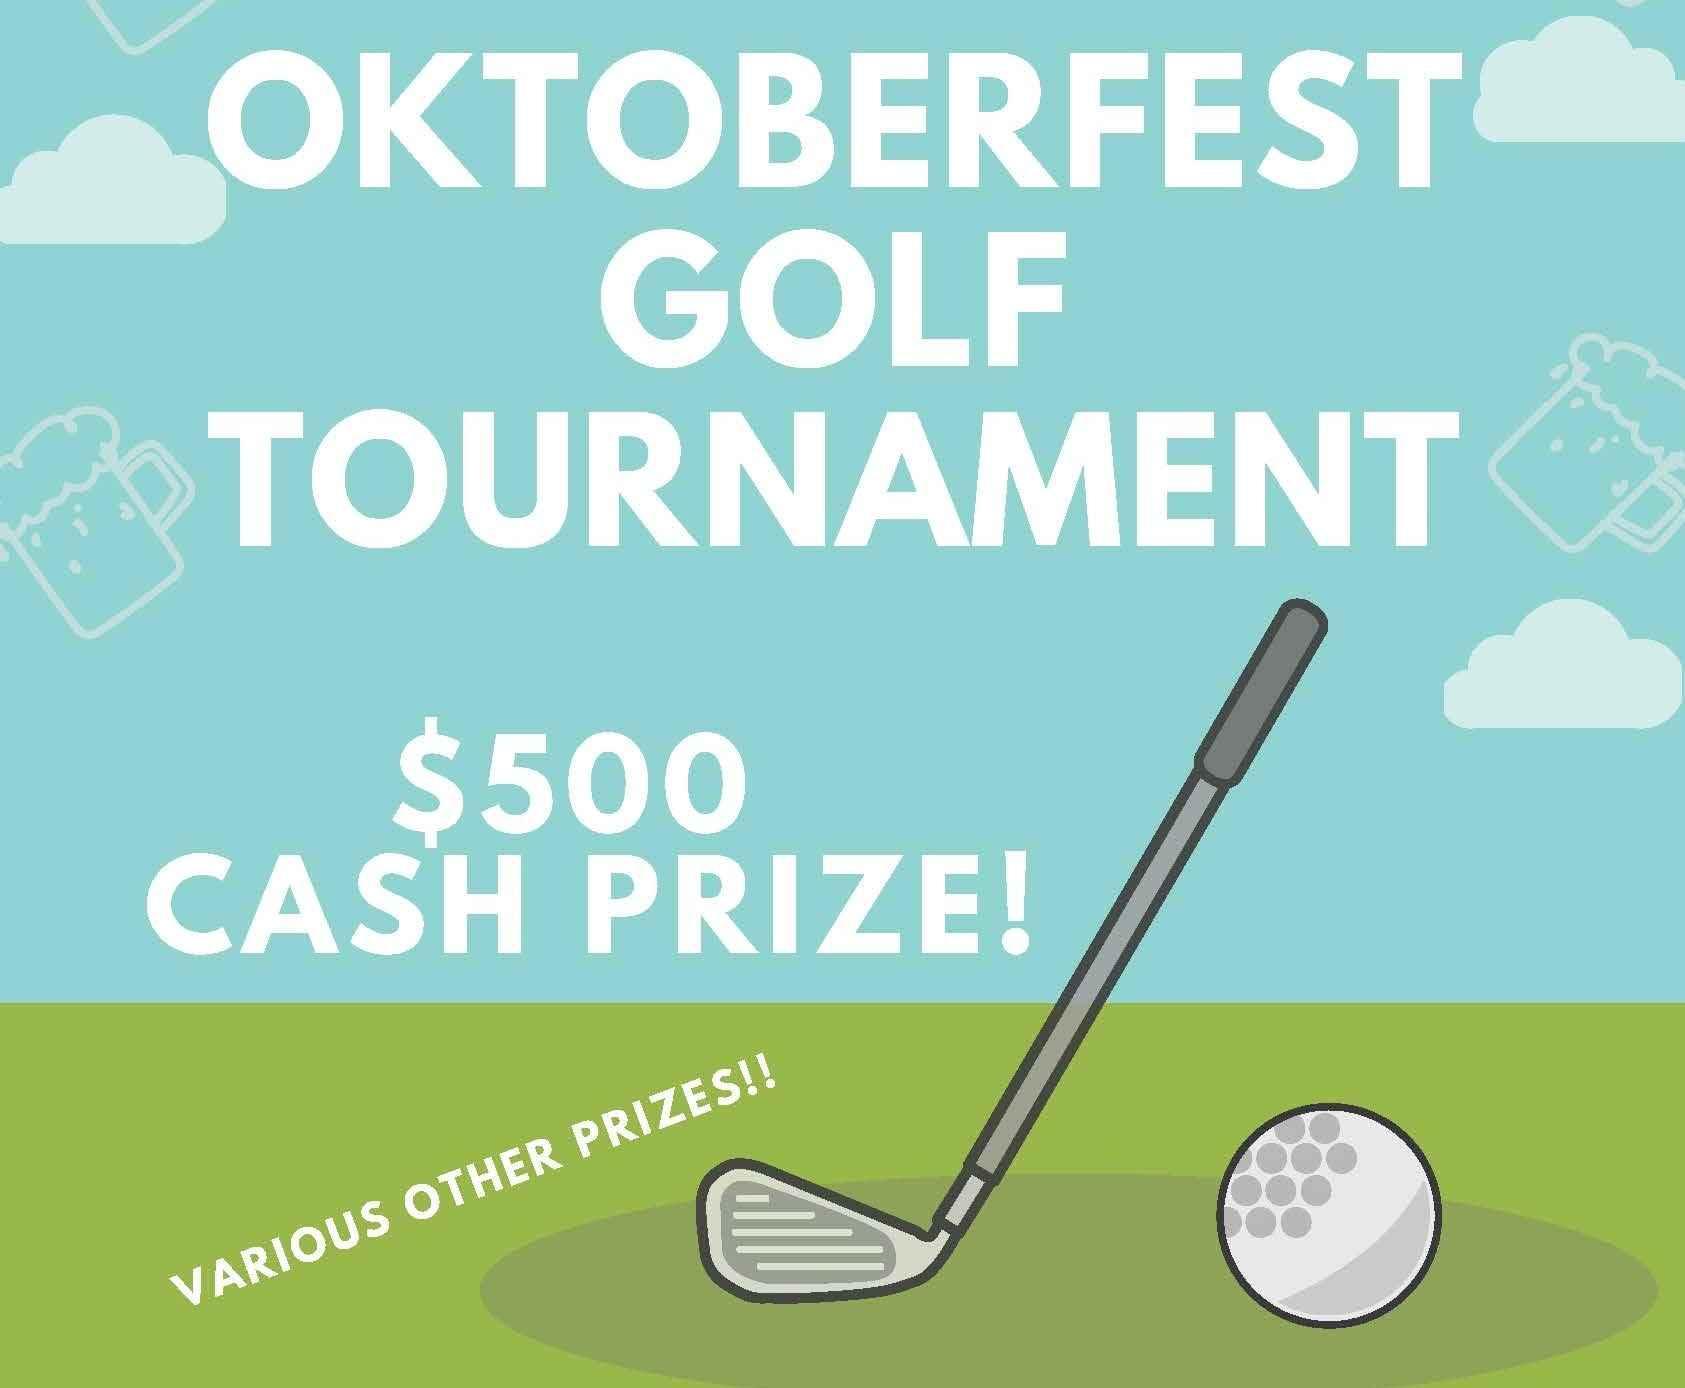 Oktoberfest Golf Tournament image